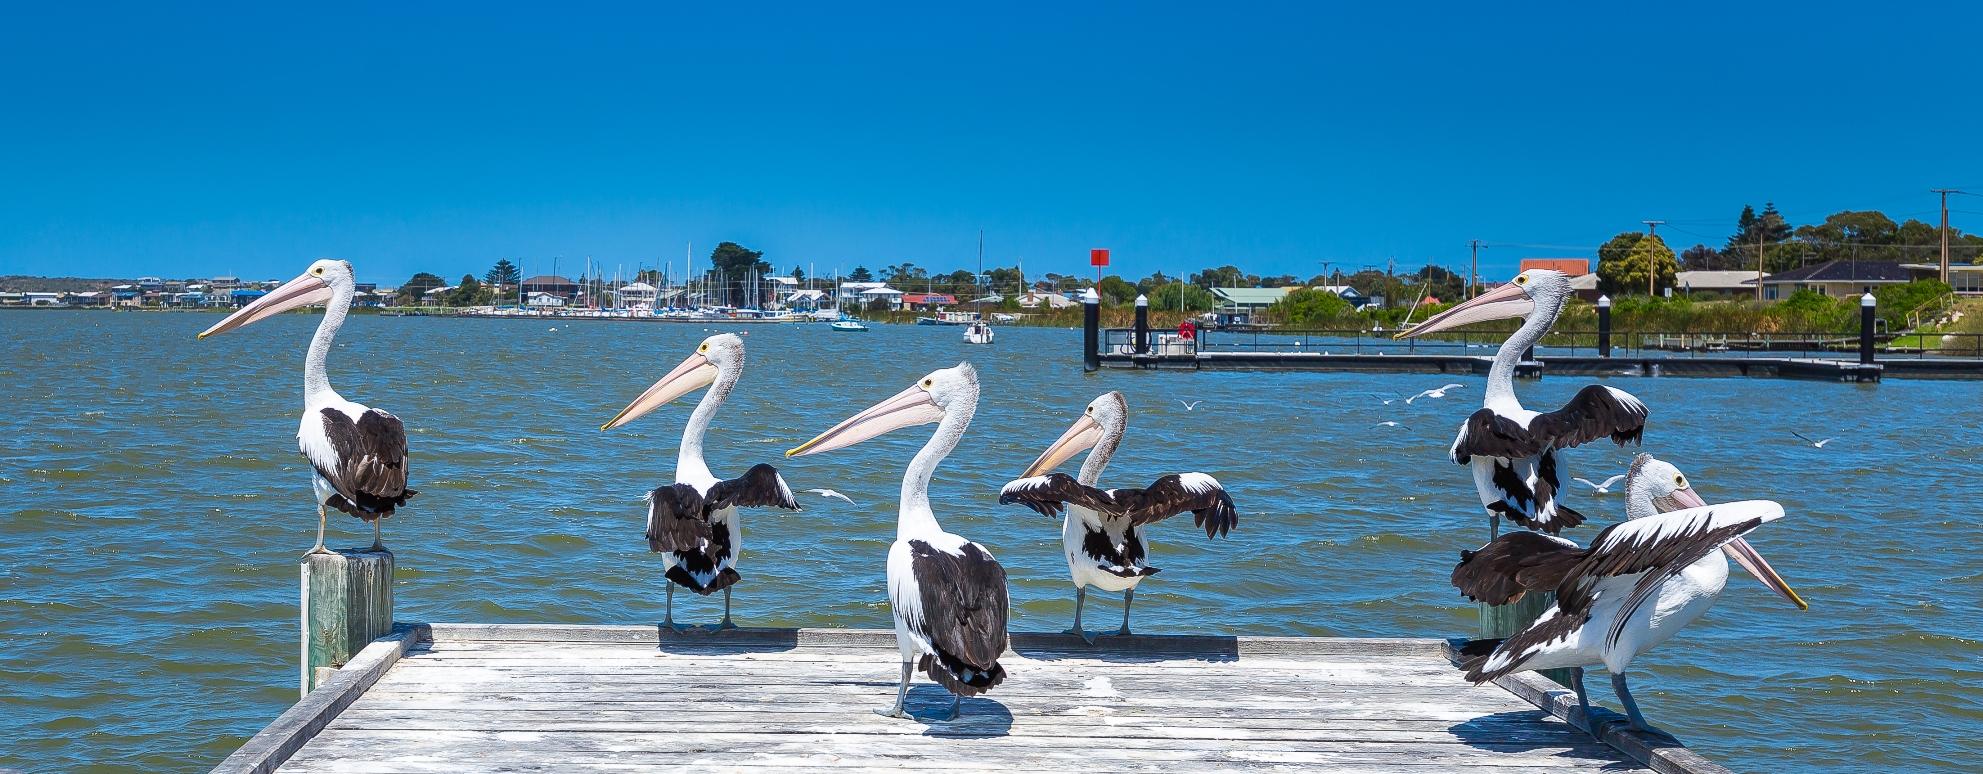 Pelicans Goolwa Wharf